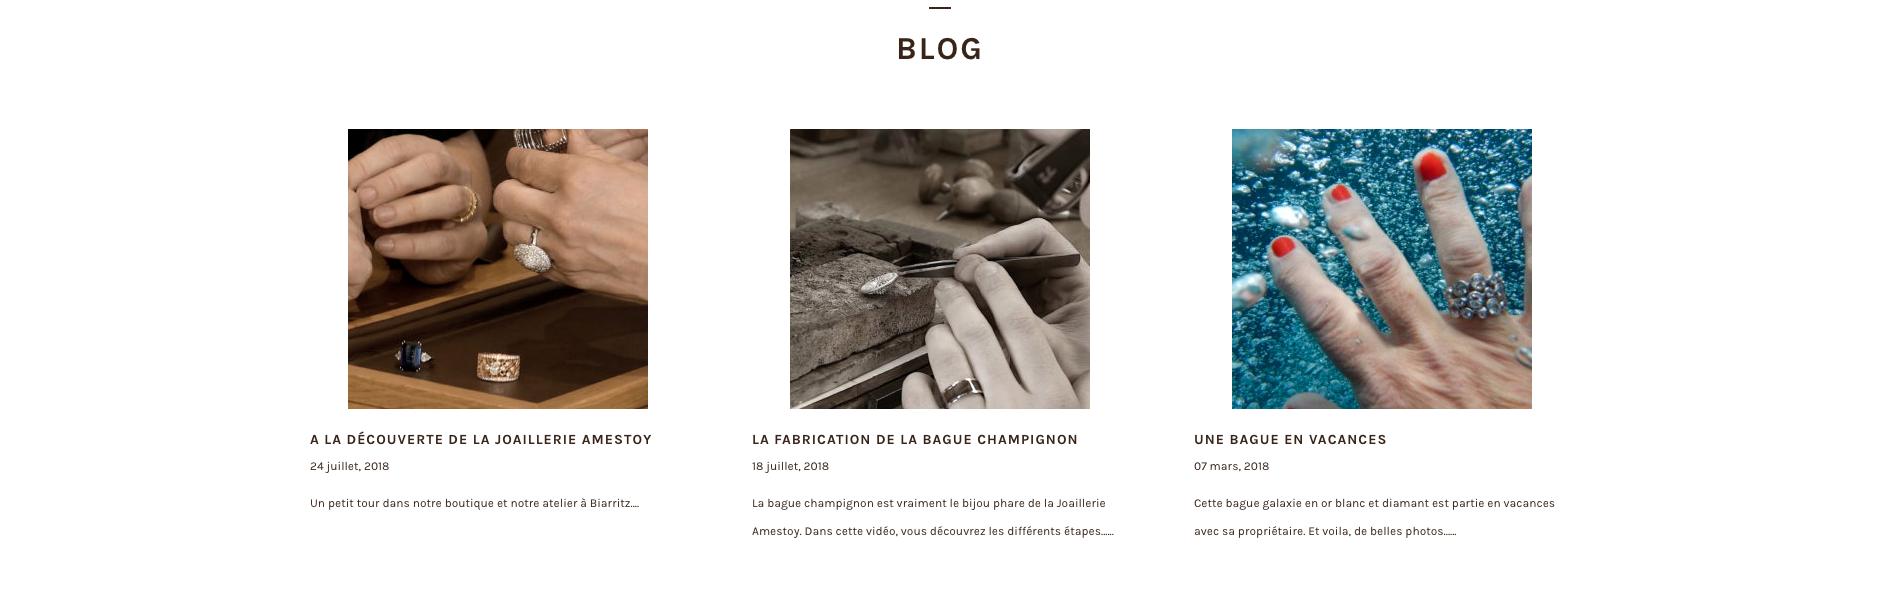 amestoy blog